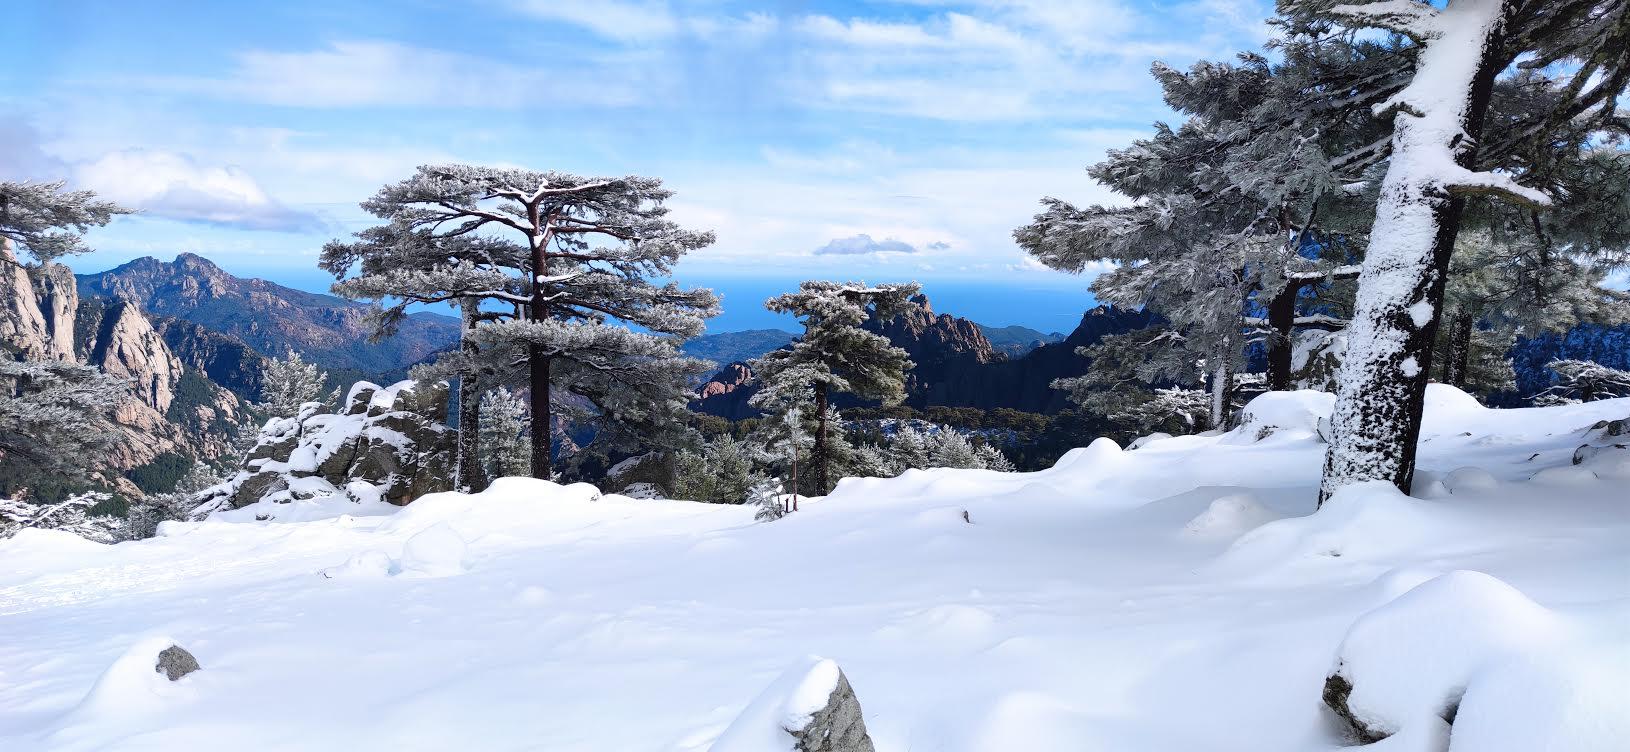 Vue sur Solenzara et la mer Tyrrhénienne depuis Bavella (tonytotoas)